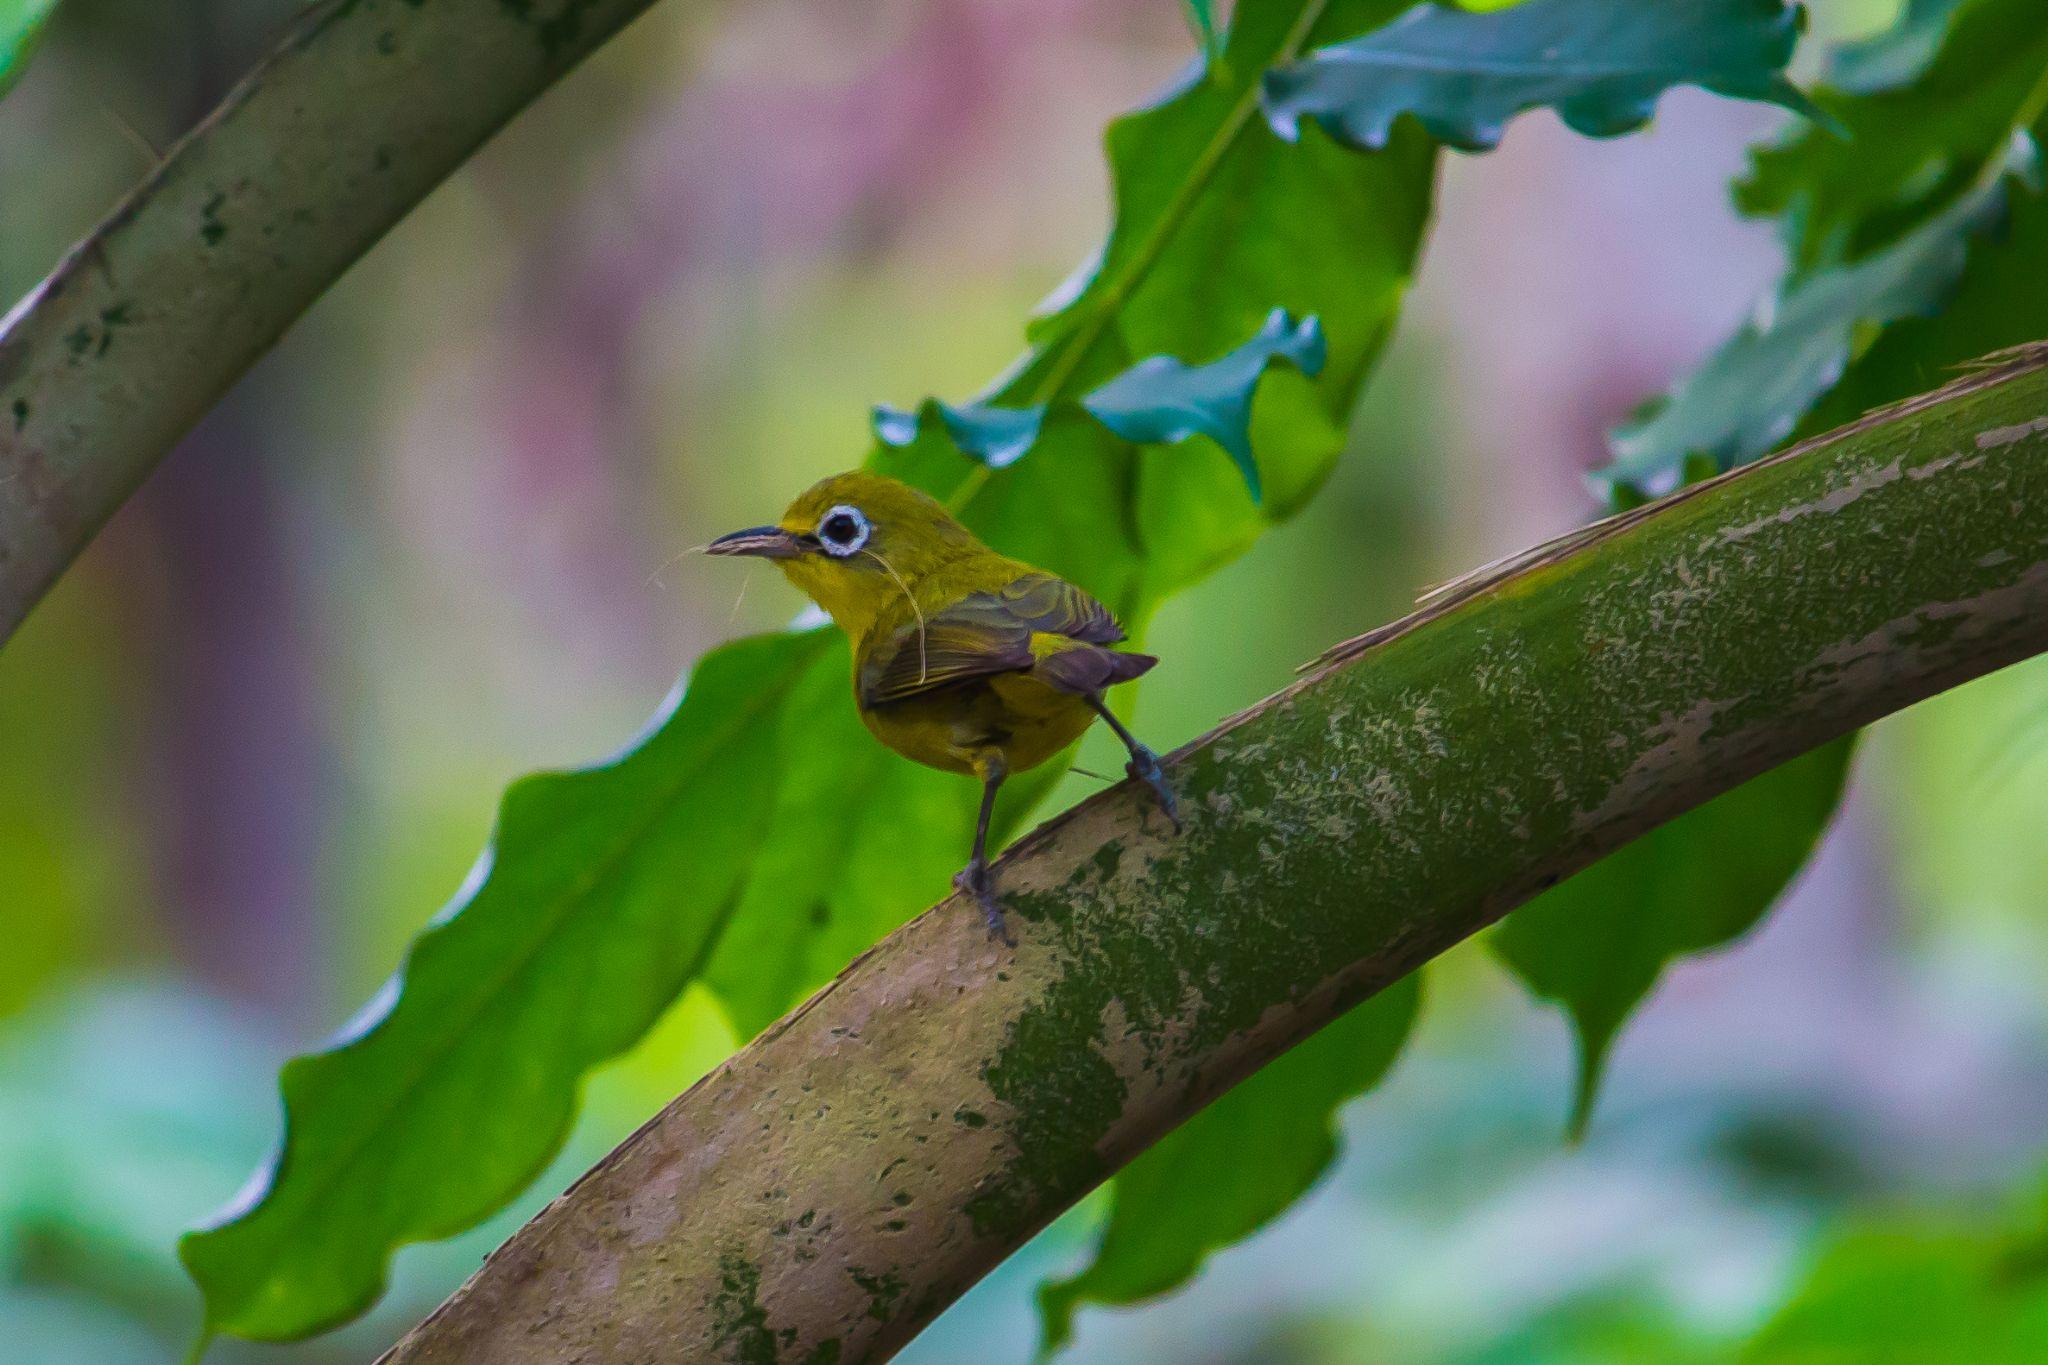 Ready to Nest by Gareth Sawbridge